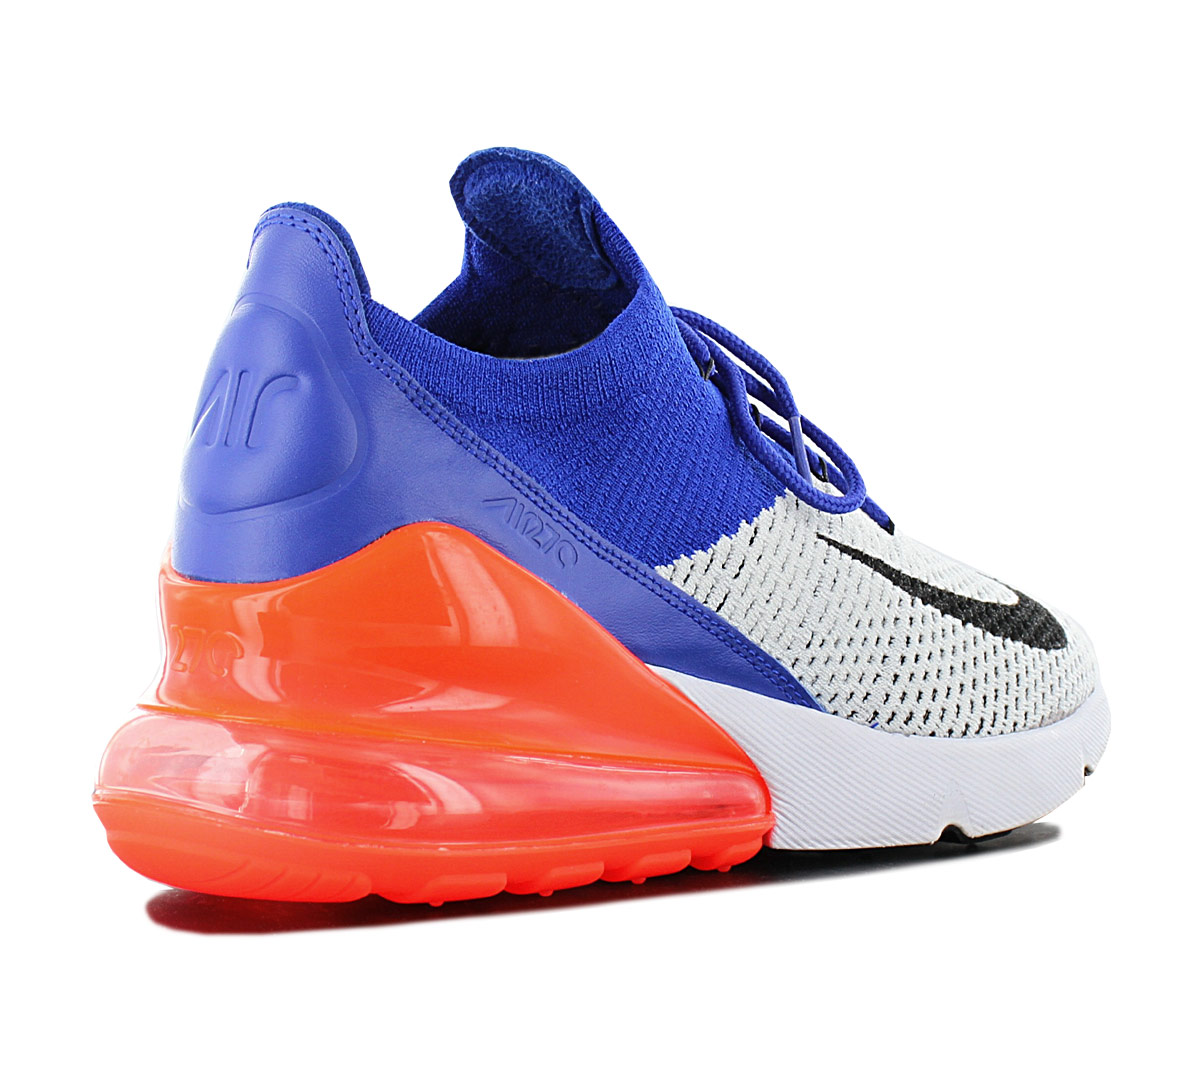 Details zu NEU Nike Air Max 270 Flyknit Herren Schuhe Weiß AO1023 101 SALE